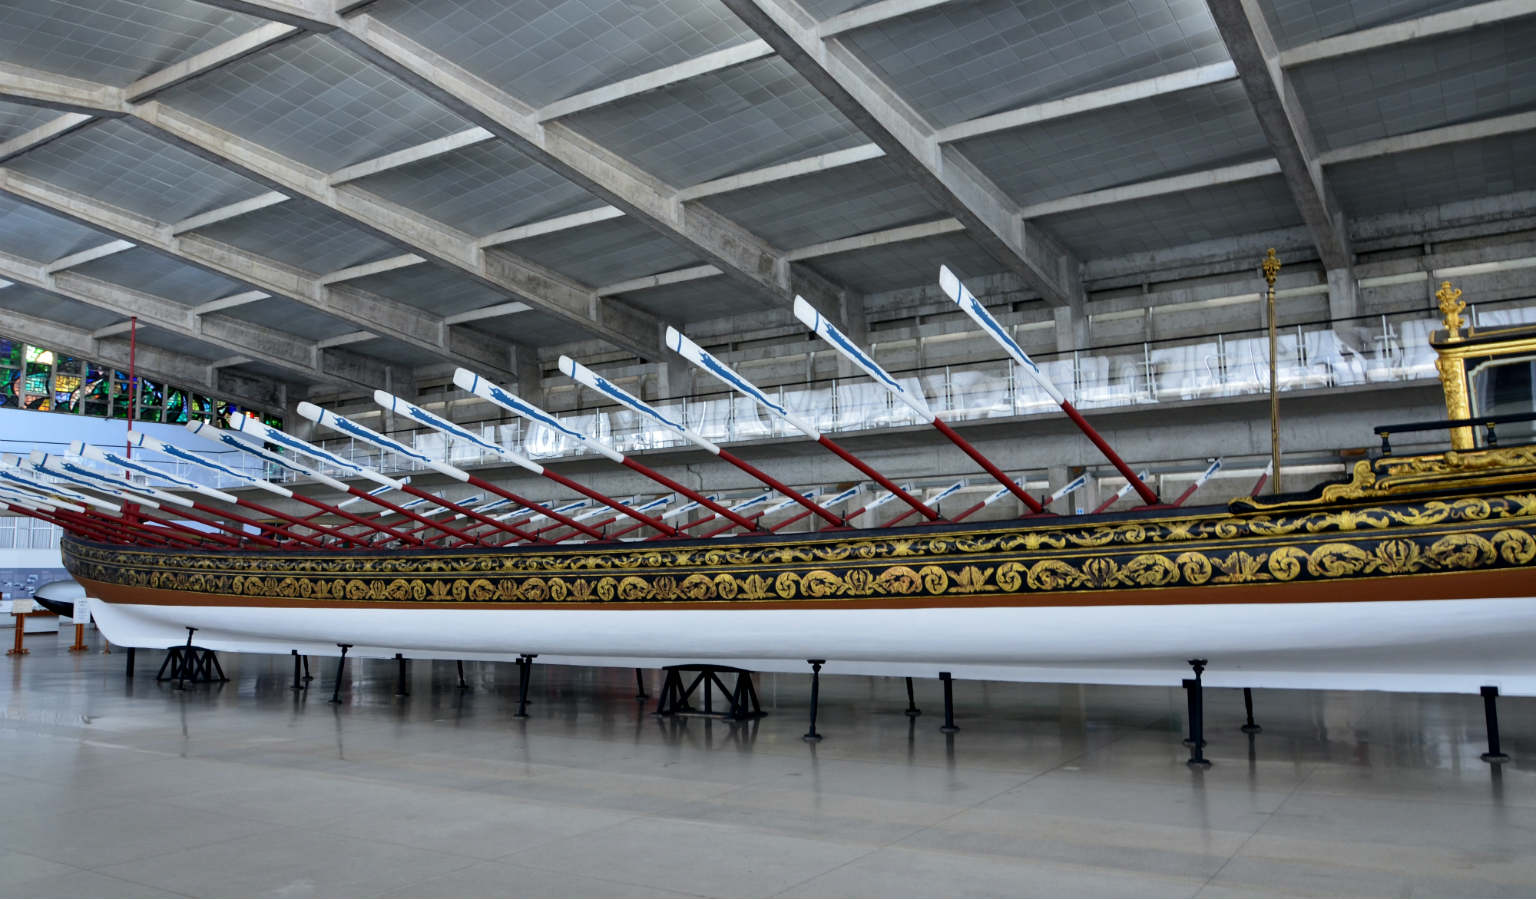 De enorme lengte van een koninklijke sloep in het National Museum of Royal Barges in Bangkok